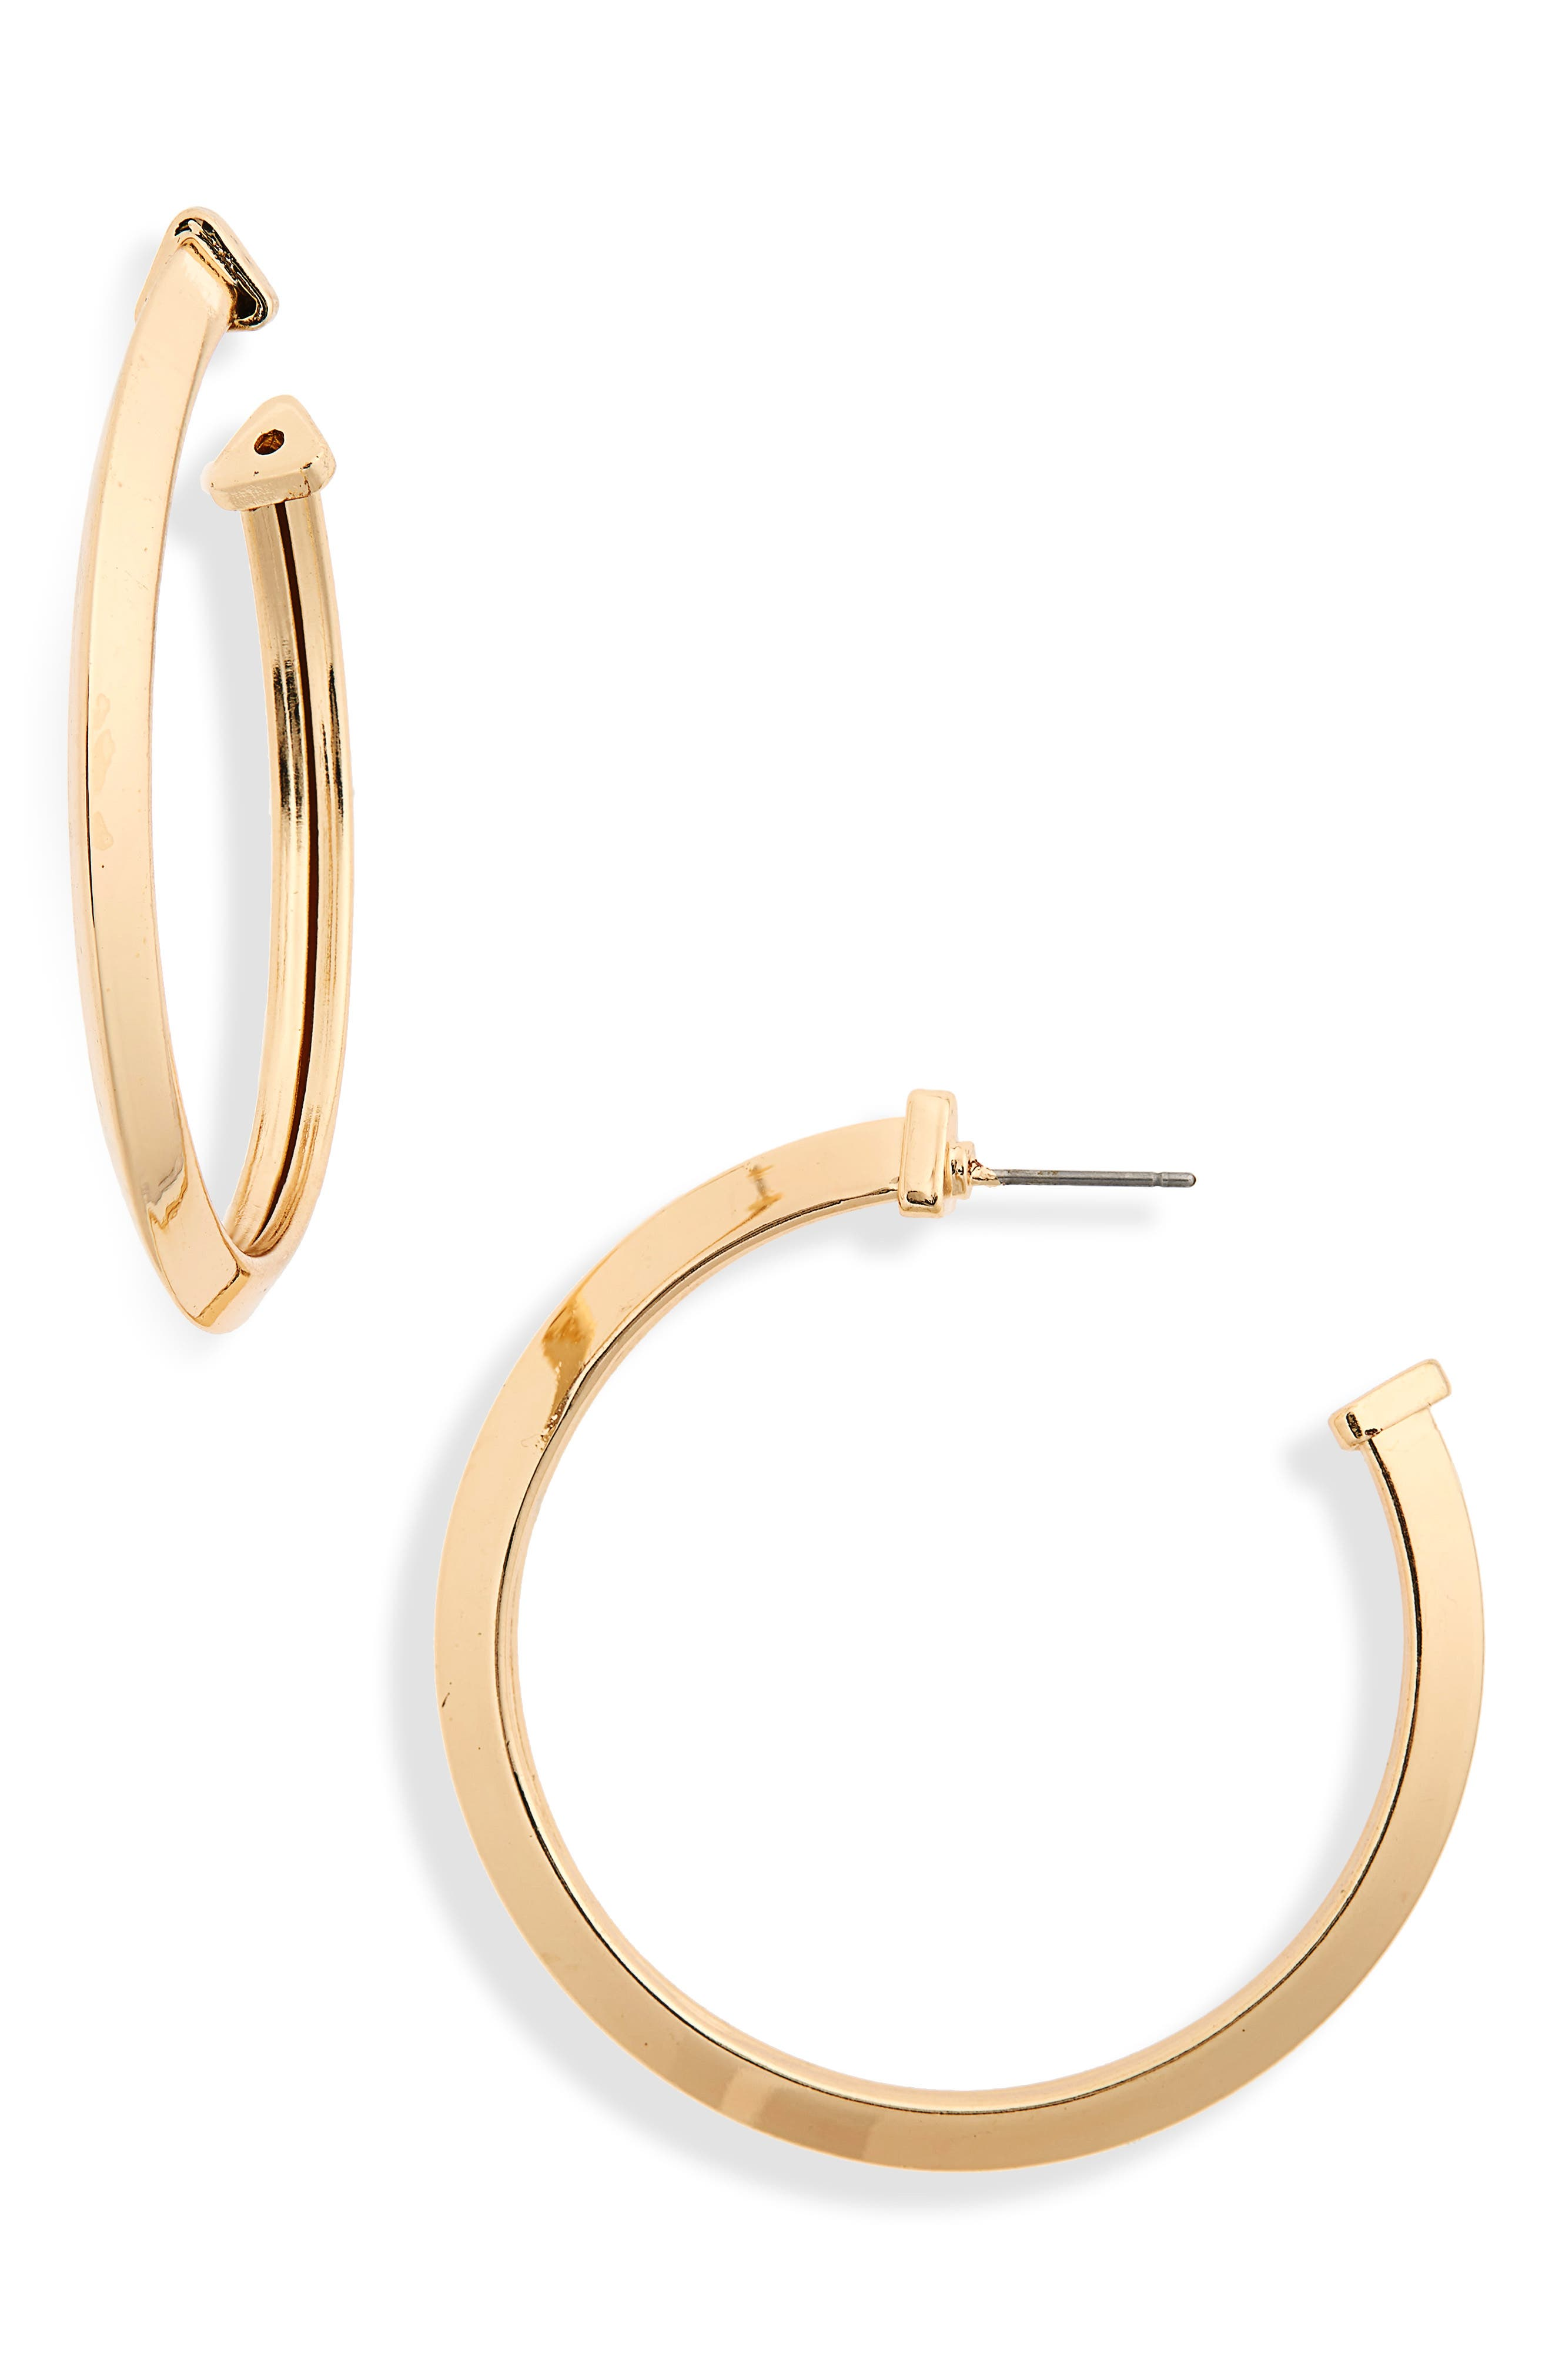 Angular Hoop Earrings,                             Main thumbnail 1, color,                             710